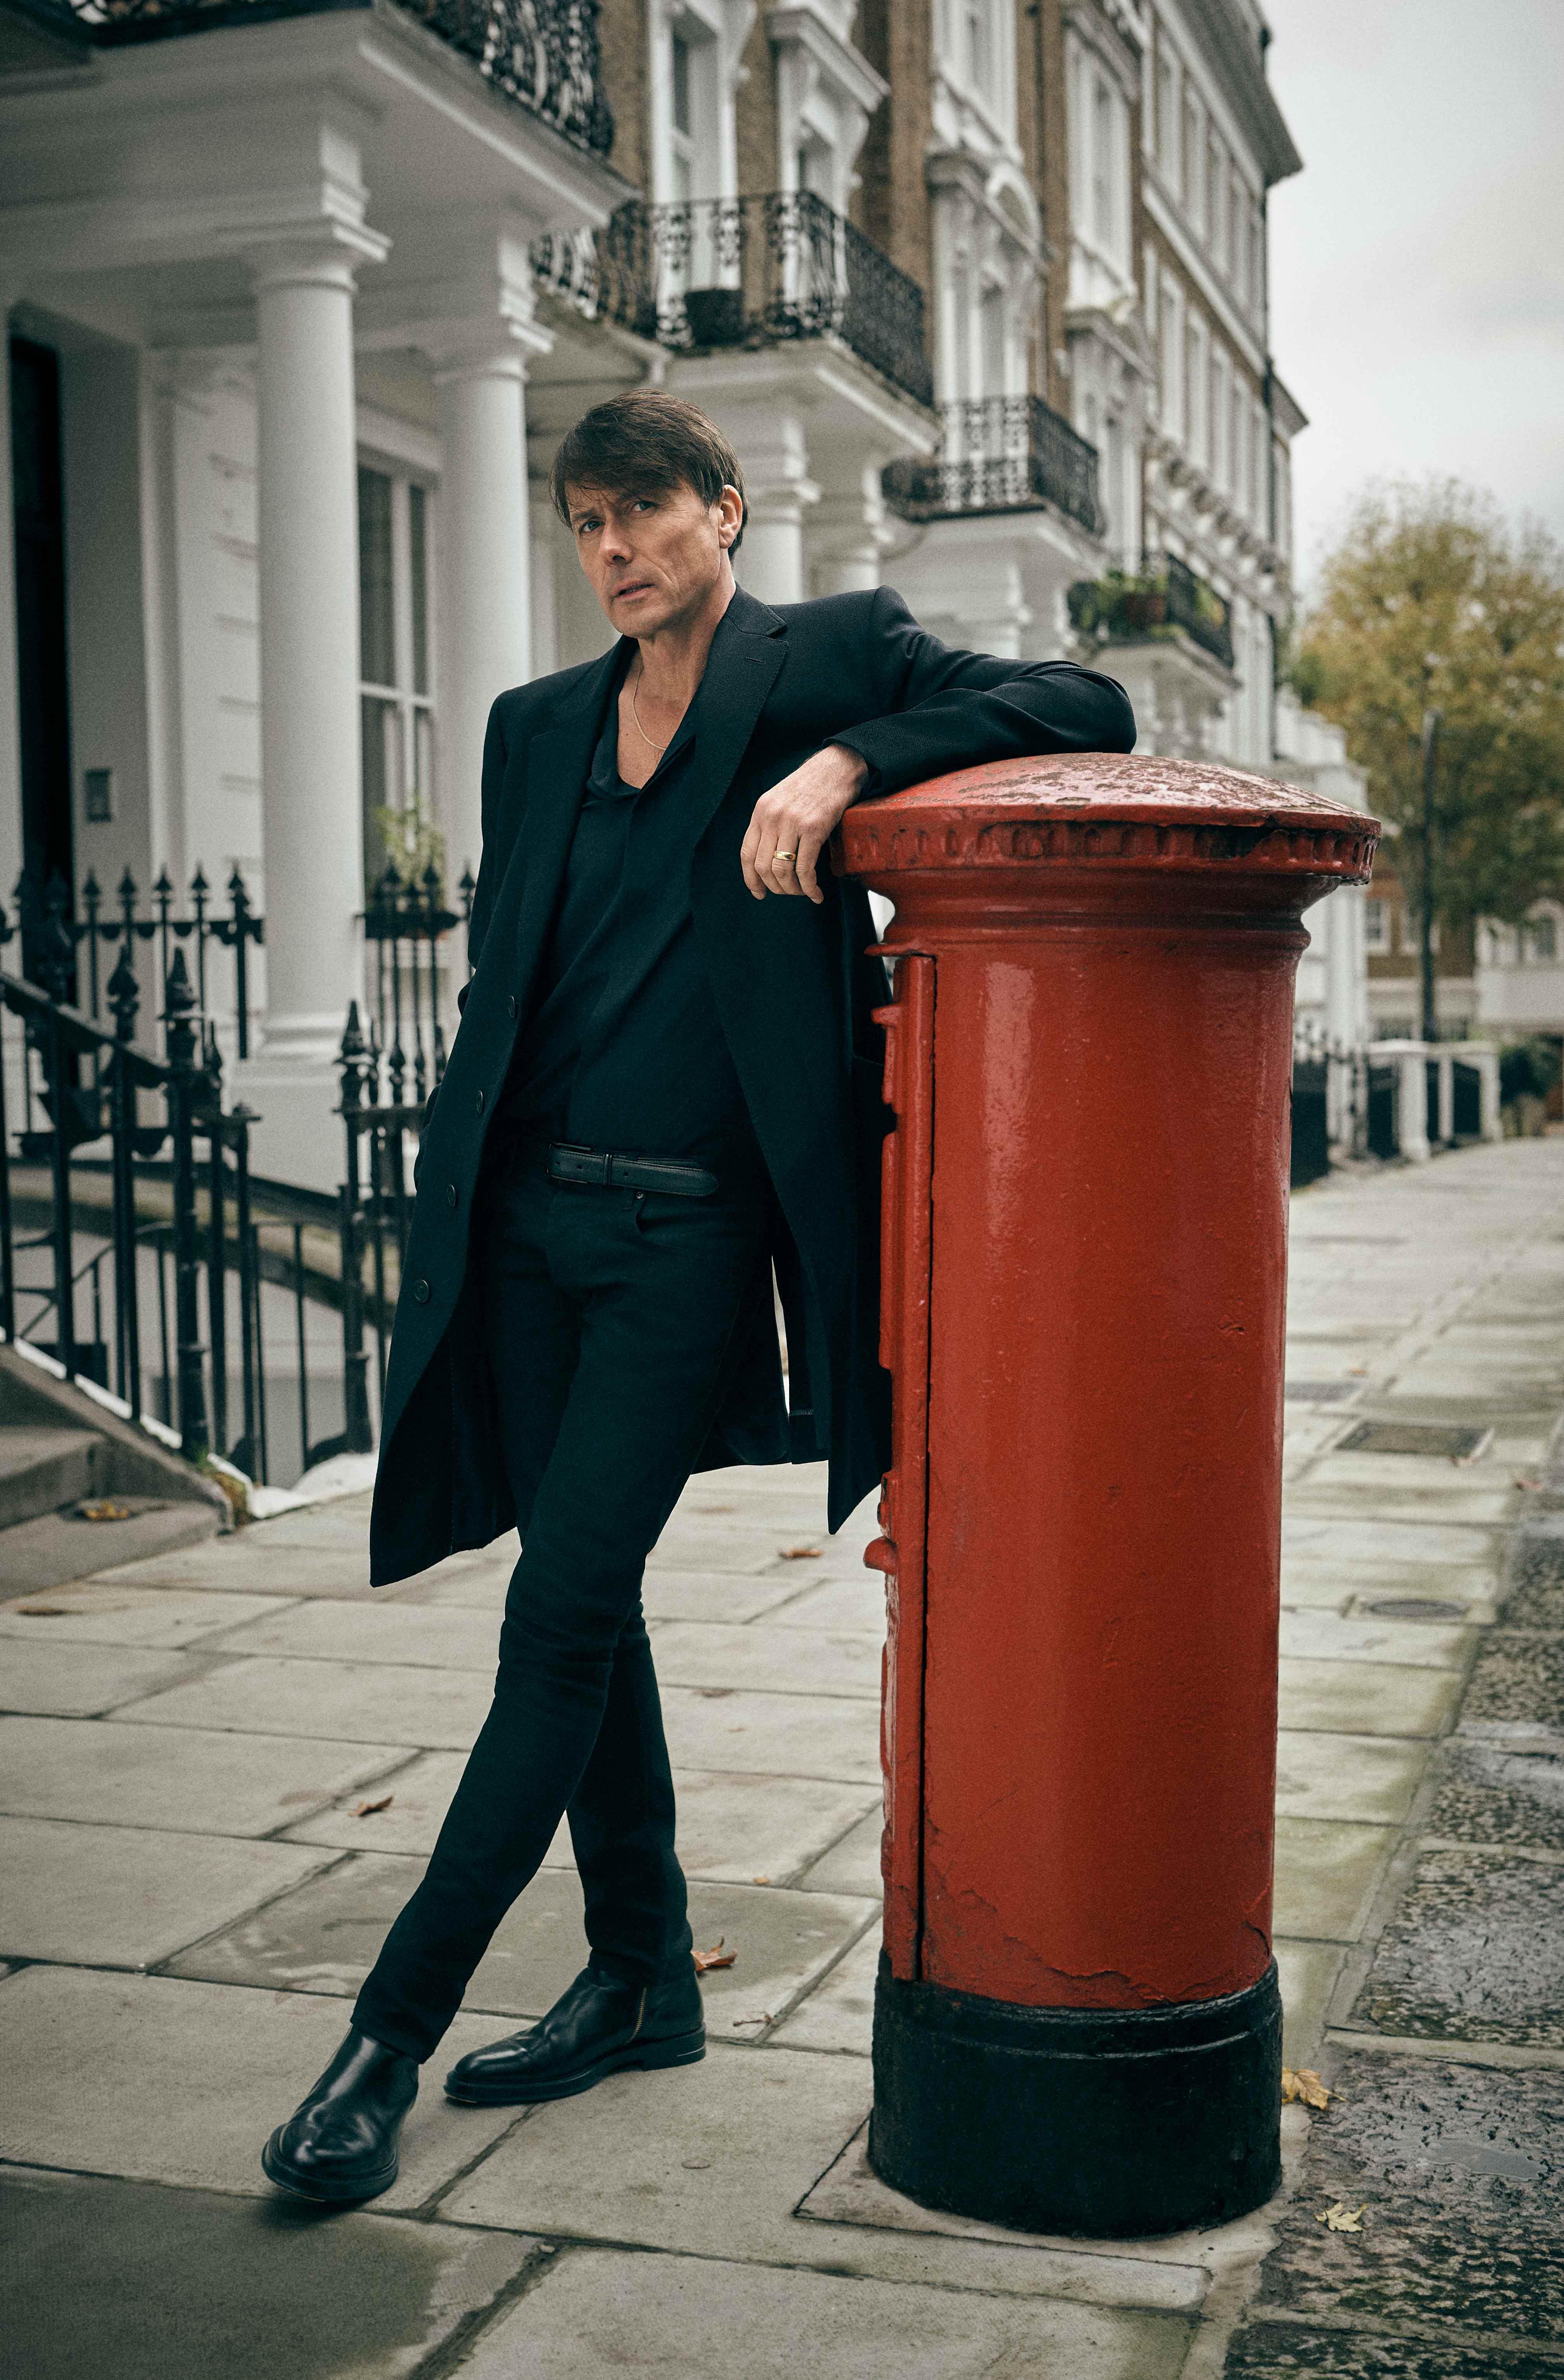 Brett Anderson, lead singer of Britpop band Suede